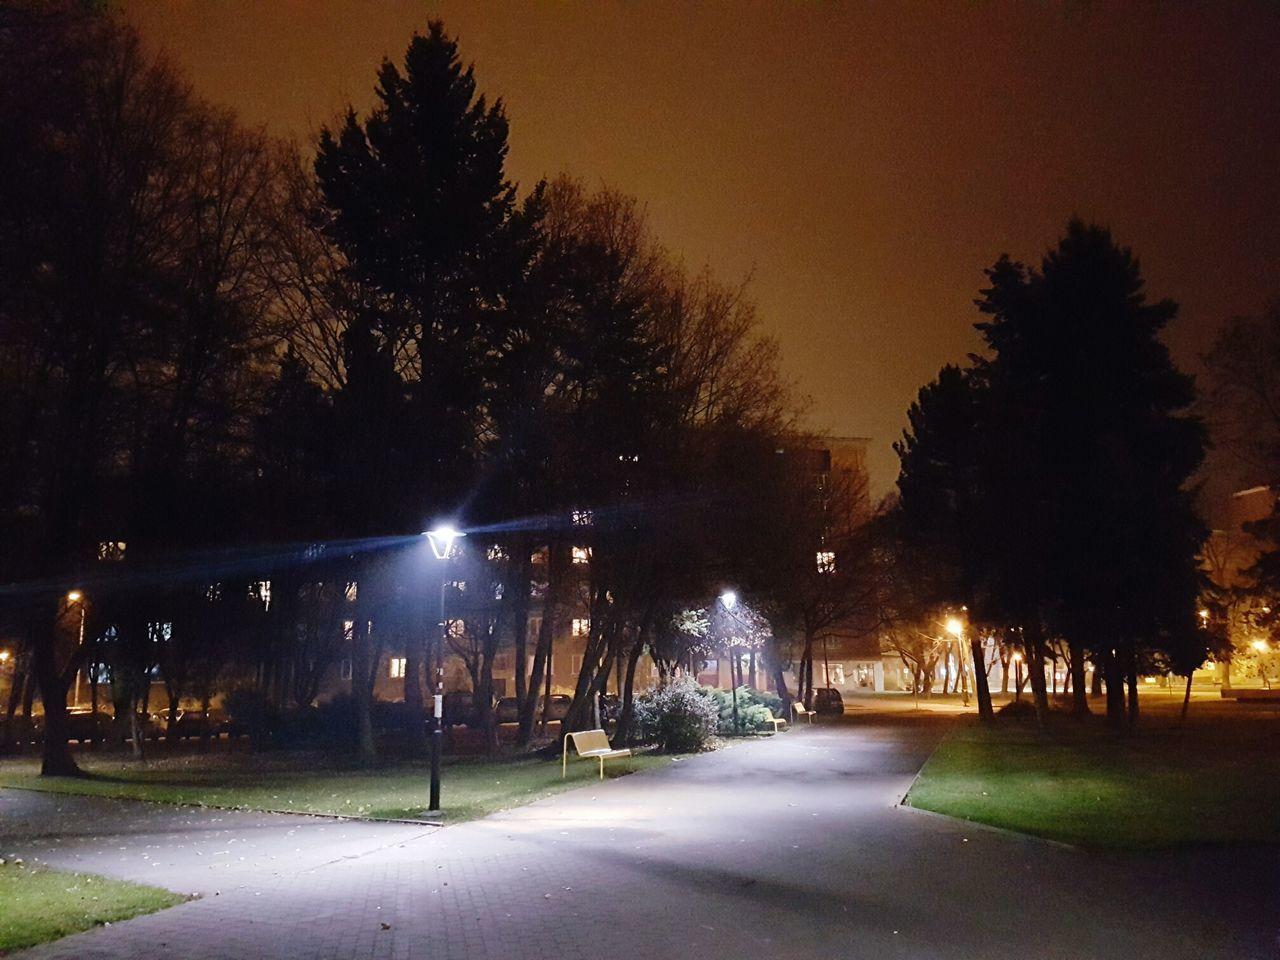 Tree Night No People Social Issues City Outdoors Sky Plaza Ostrava Czech Republic🇨🇿 City Night Park Night Lights Tree Park